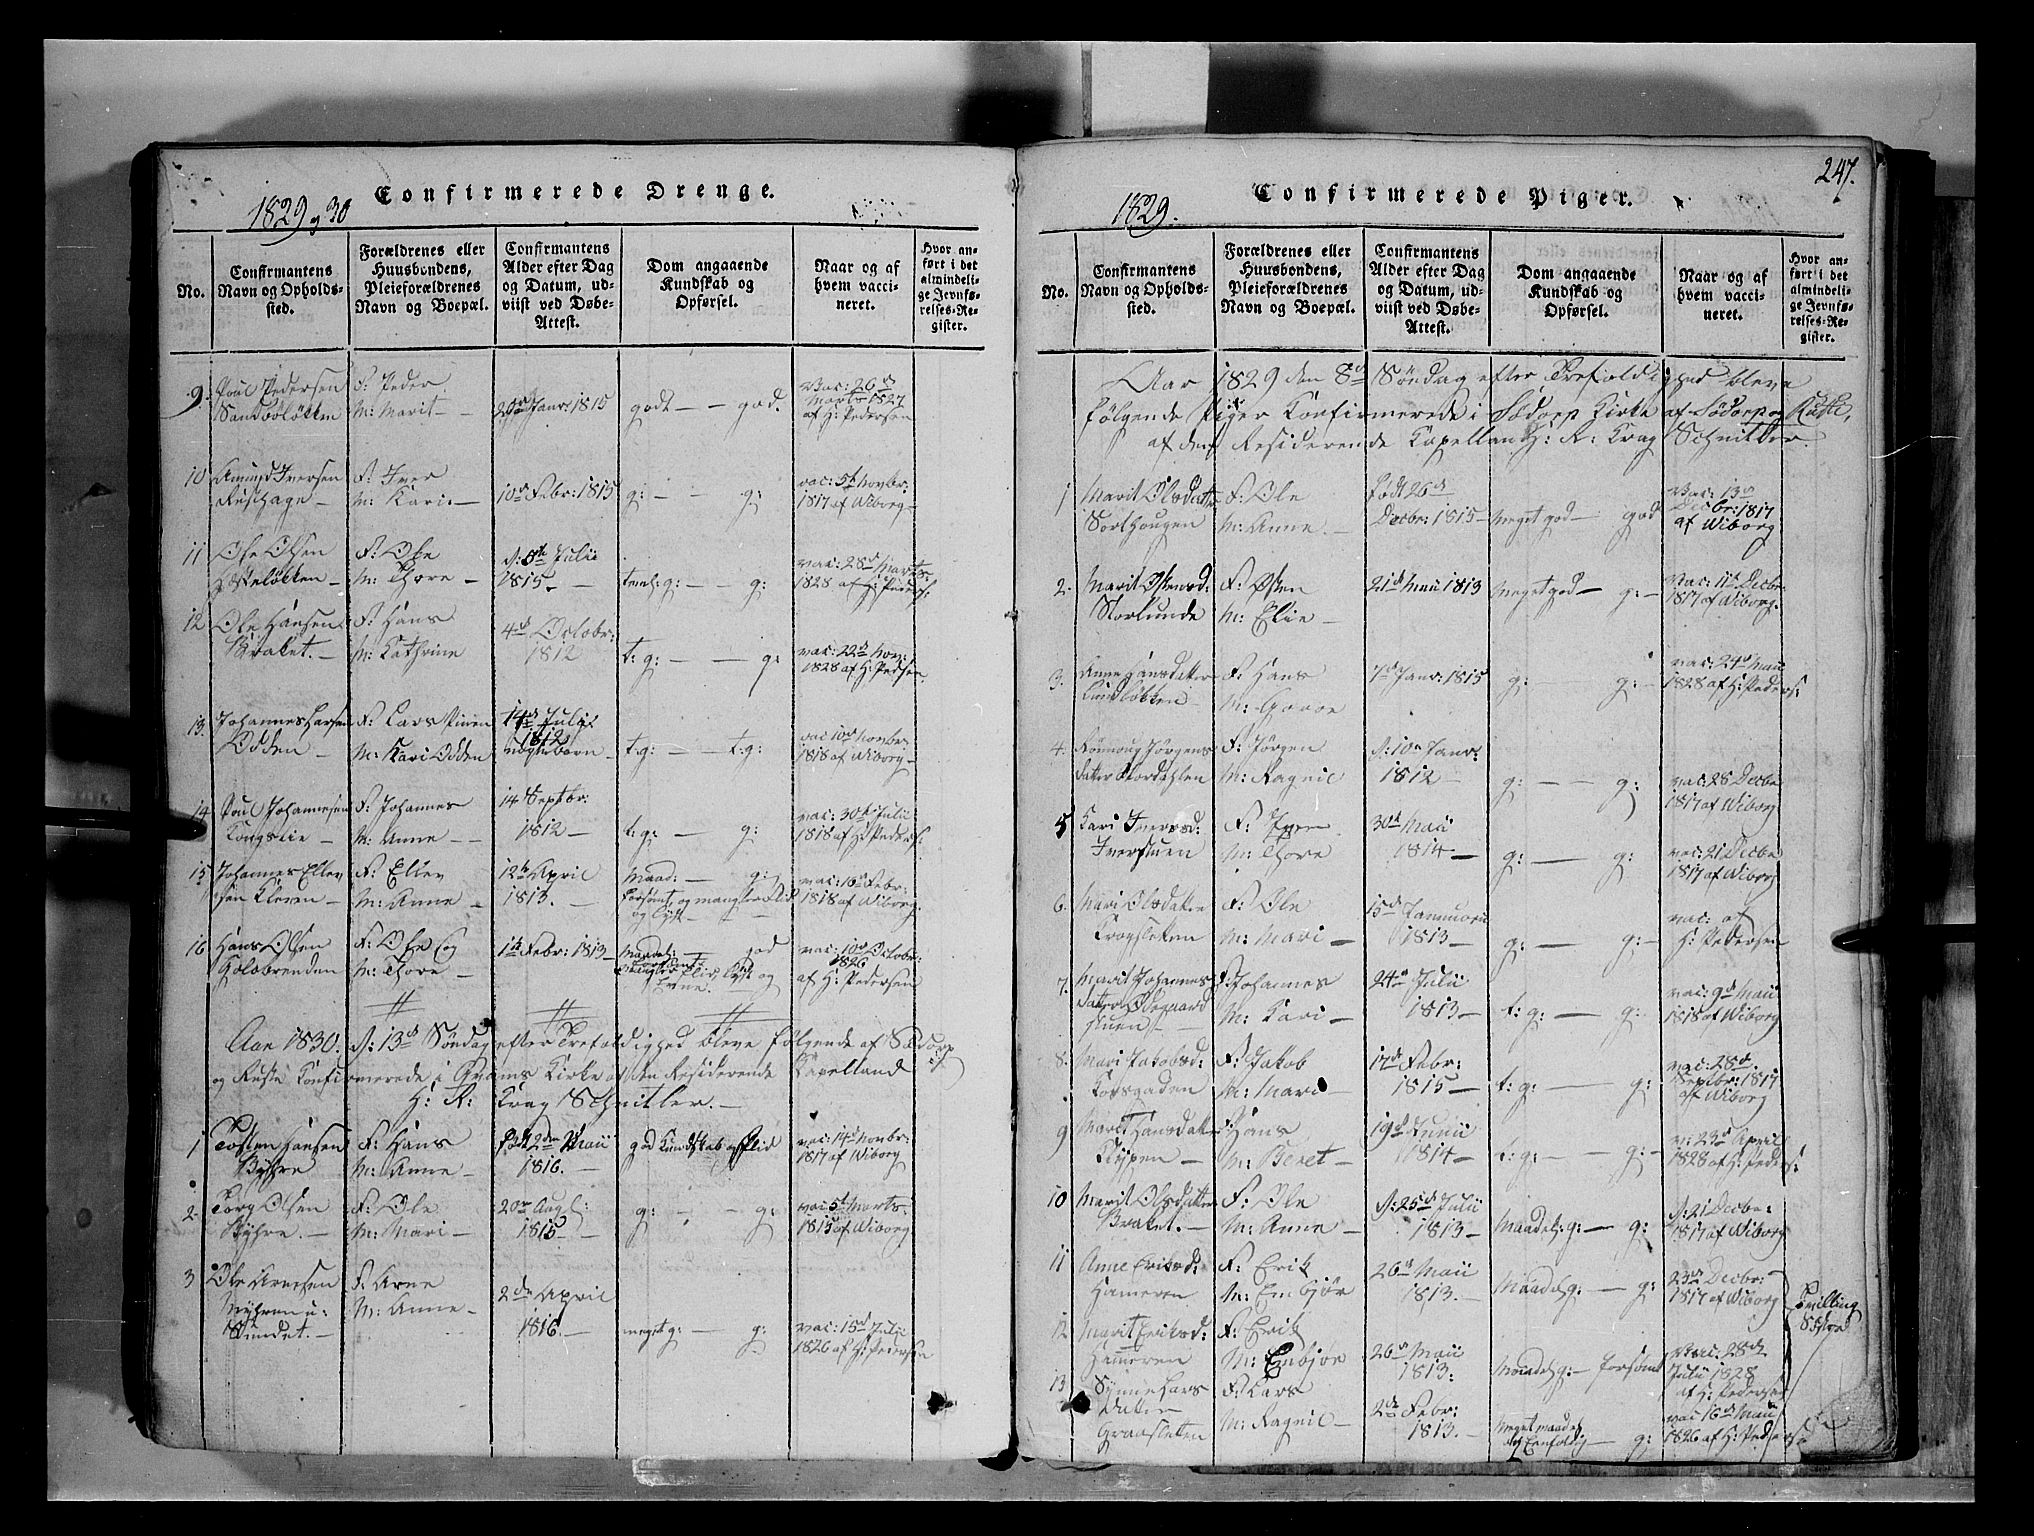 SAH, Fron prestekontor, H/Ha/Hab/L0004: Klokkerbok nr. 4, 1816-1850, s. 247